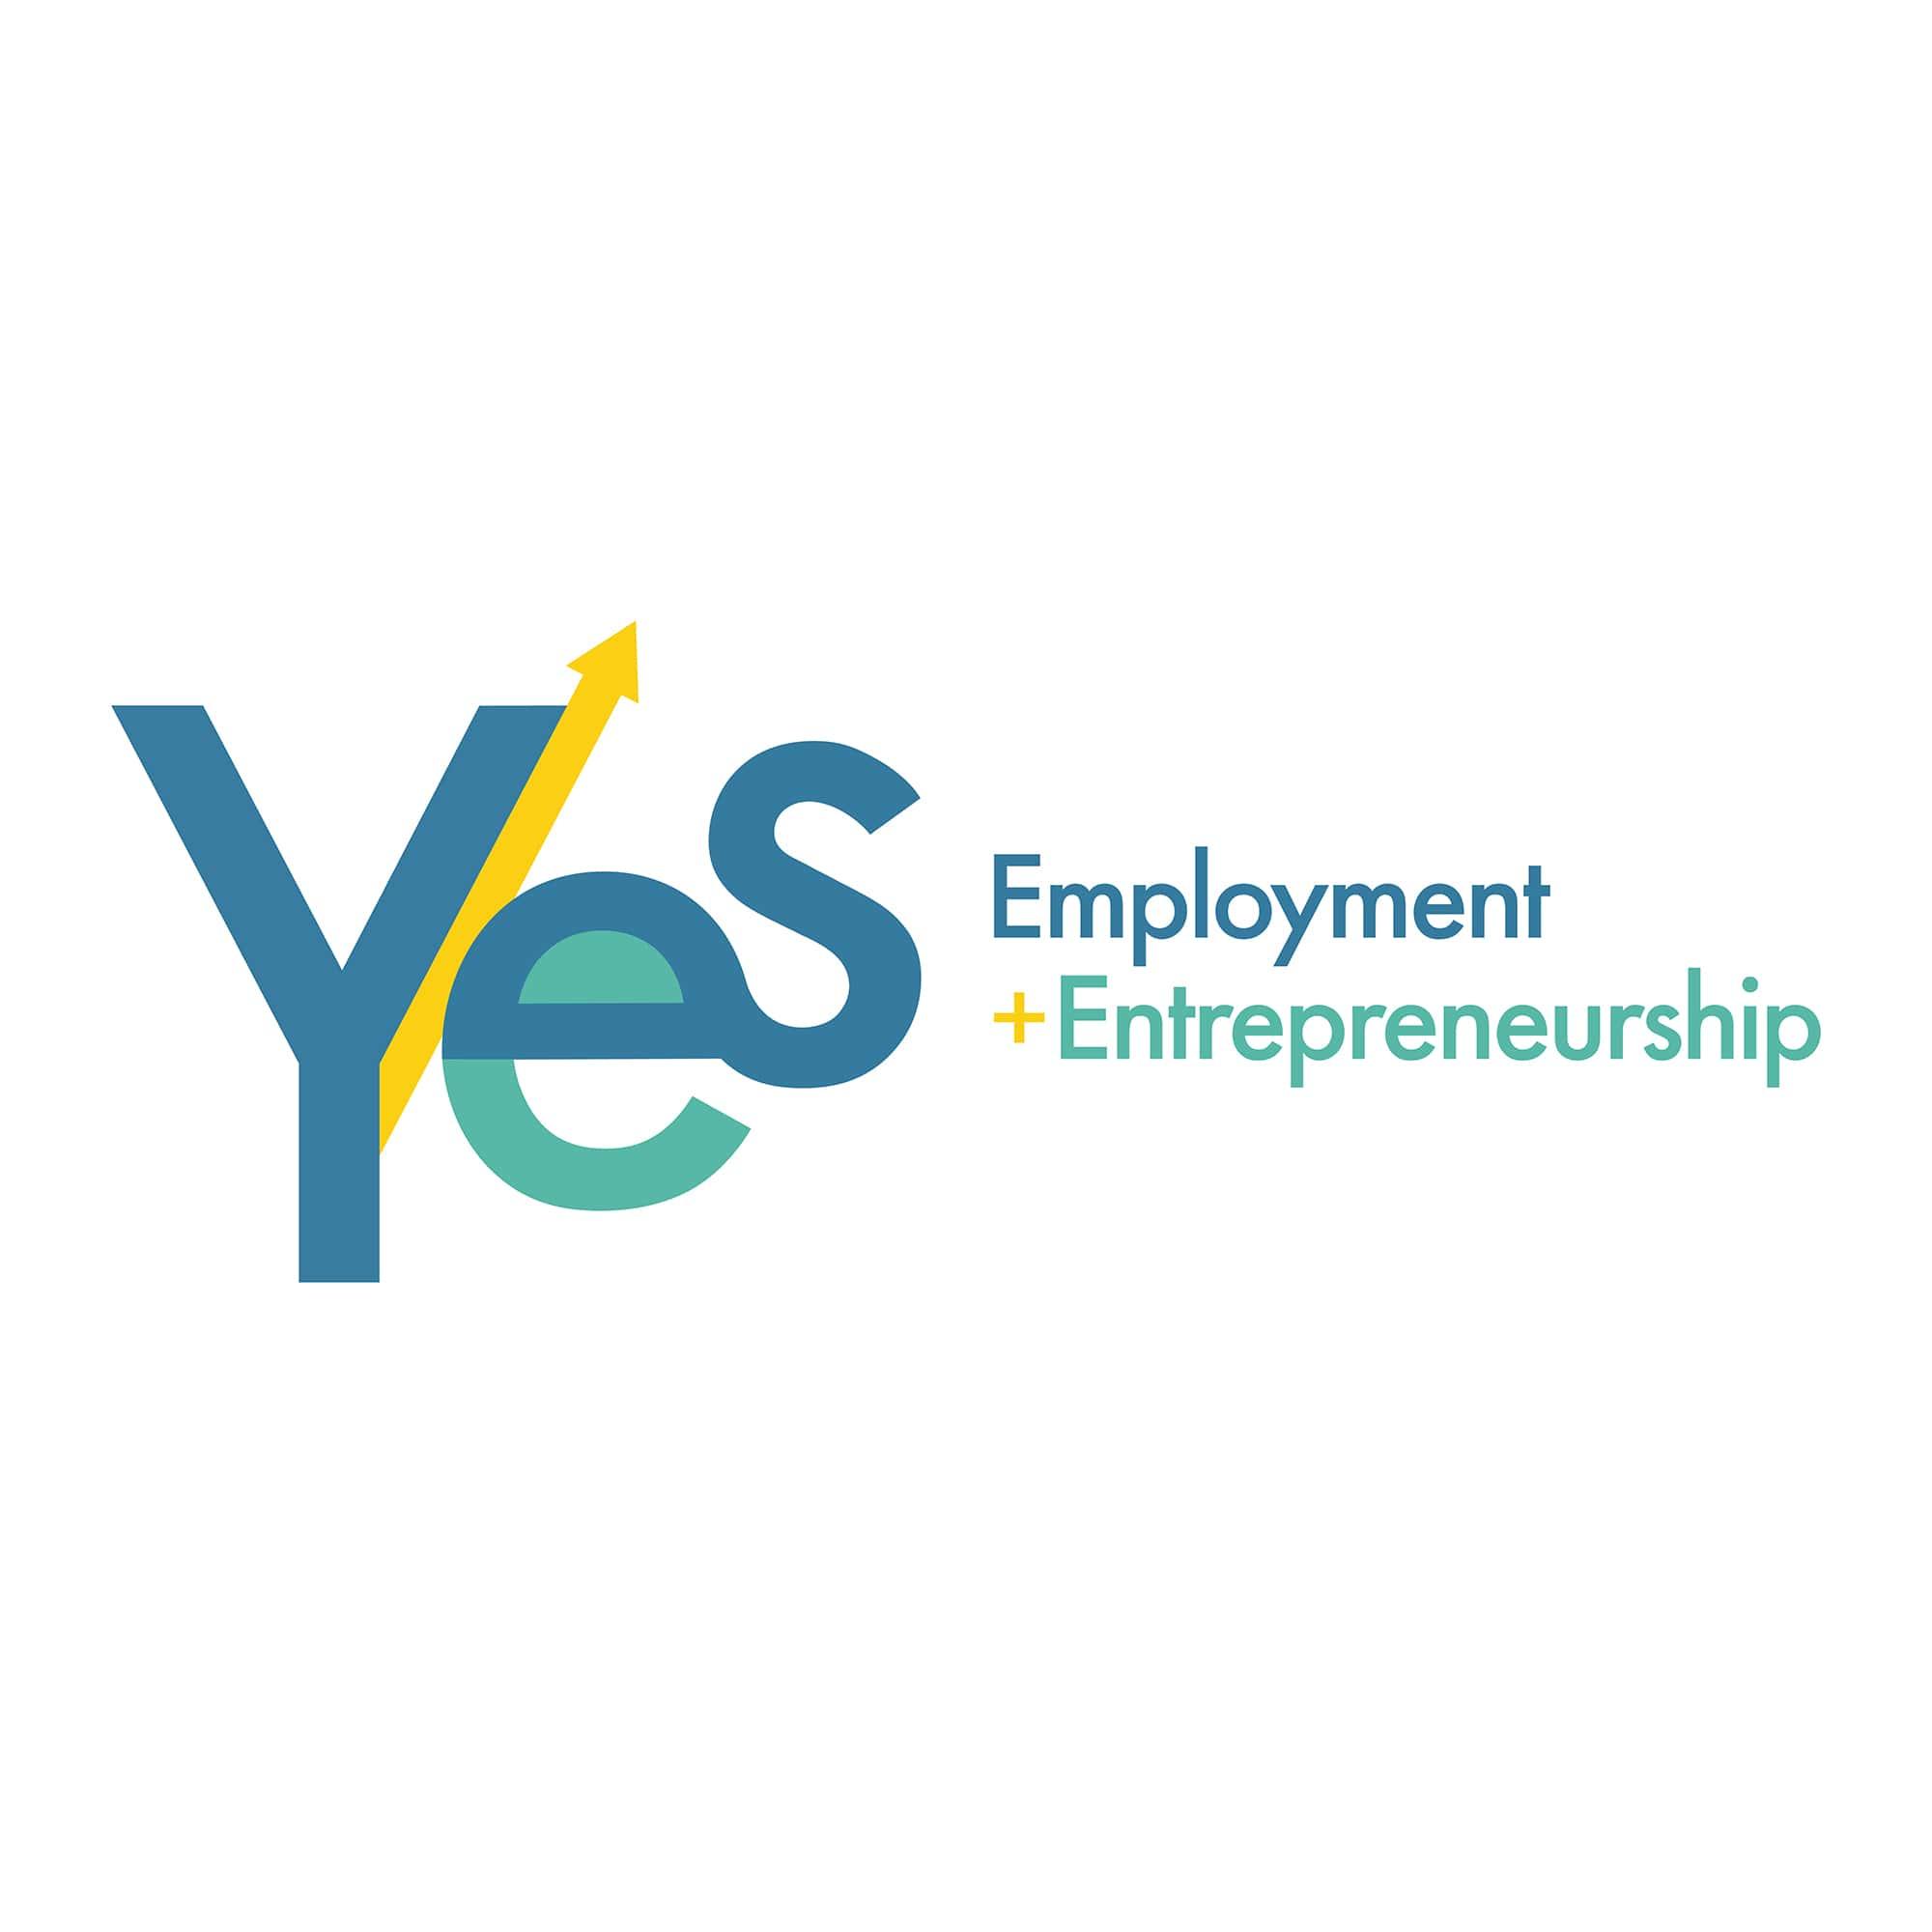 YES Employment + Entrepreneurship